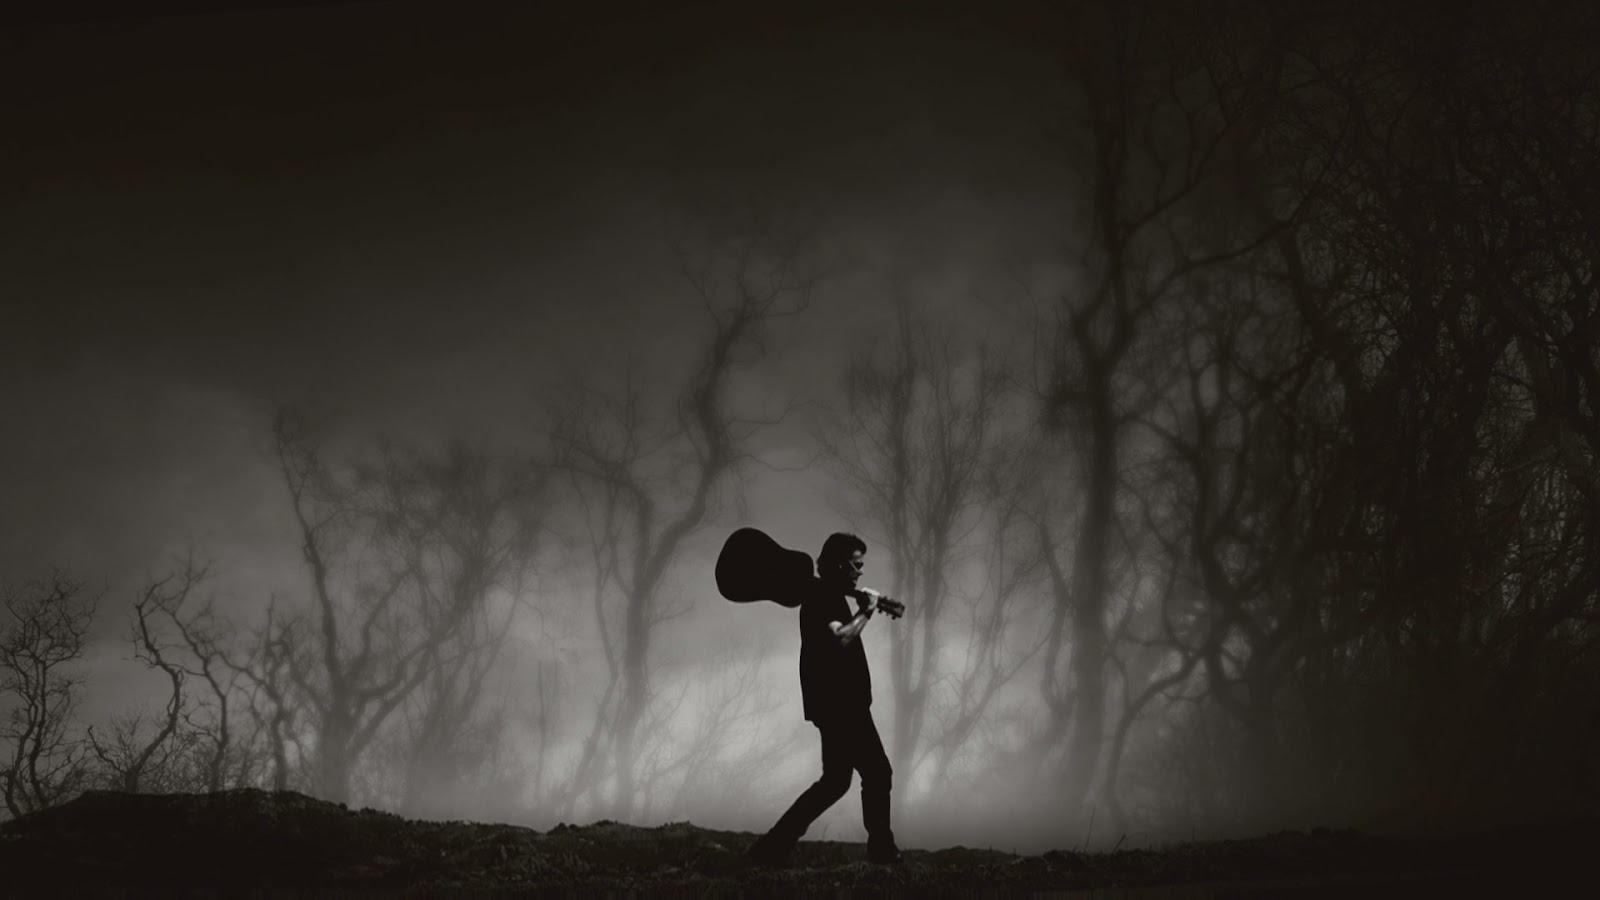 sound of silence Find album reviews, stream songs, credits and award information for sounds of silence - simon & garfunkel on allmusic - 1966 - simon & garfunkel's second album.